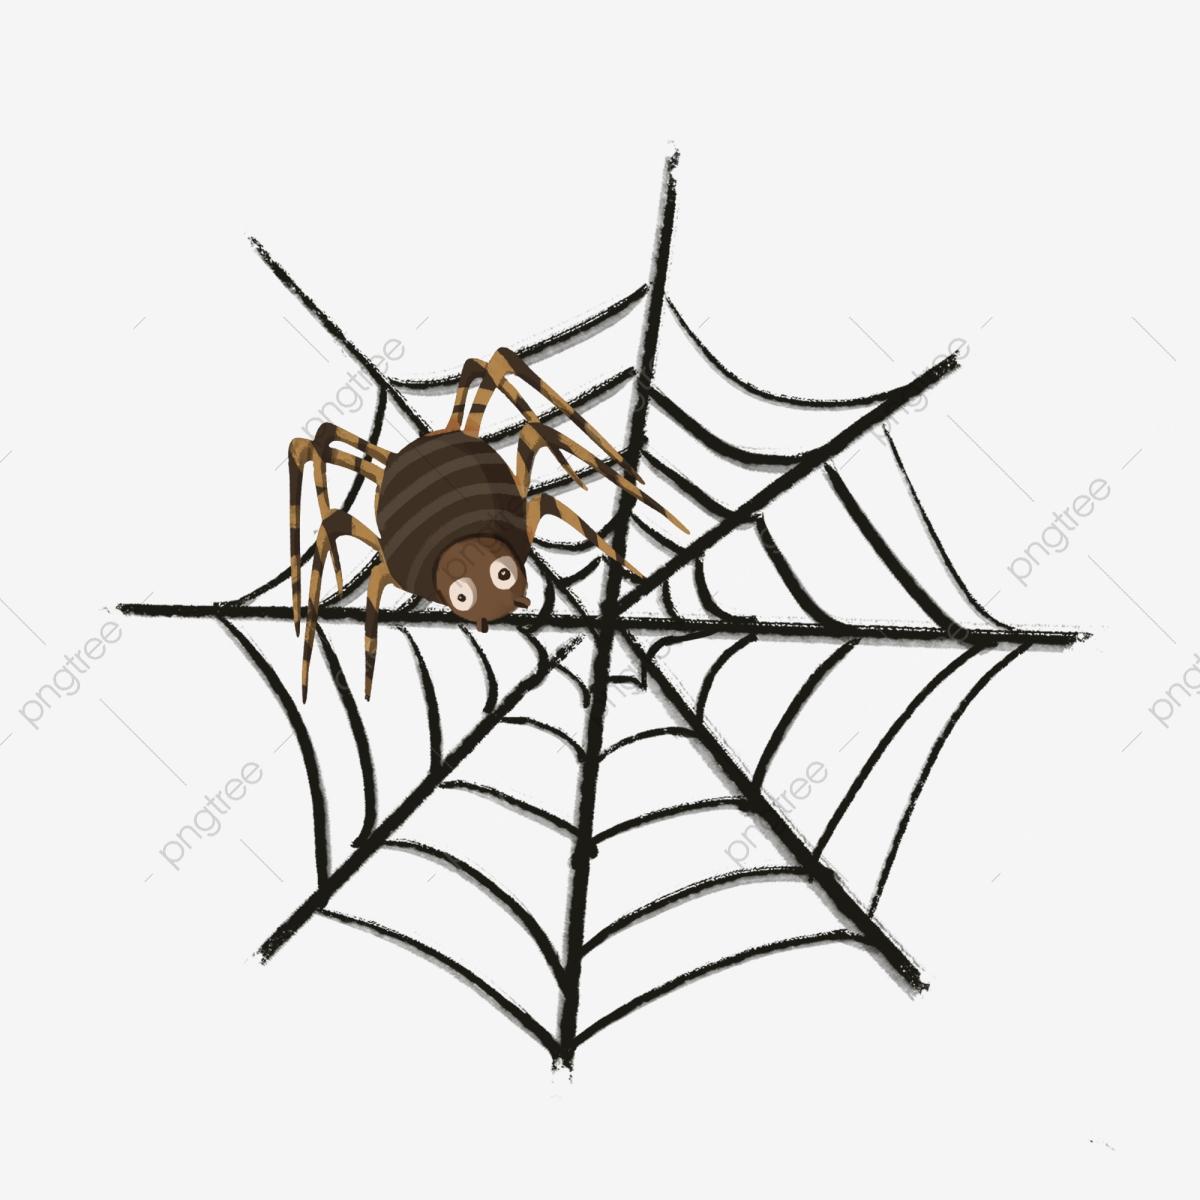 Halloween Thème Toile Daraignée Araignée, Dessin Animé tout Toile D Araignée Dessin